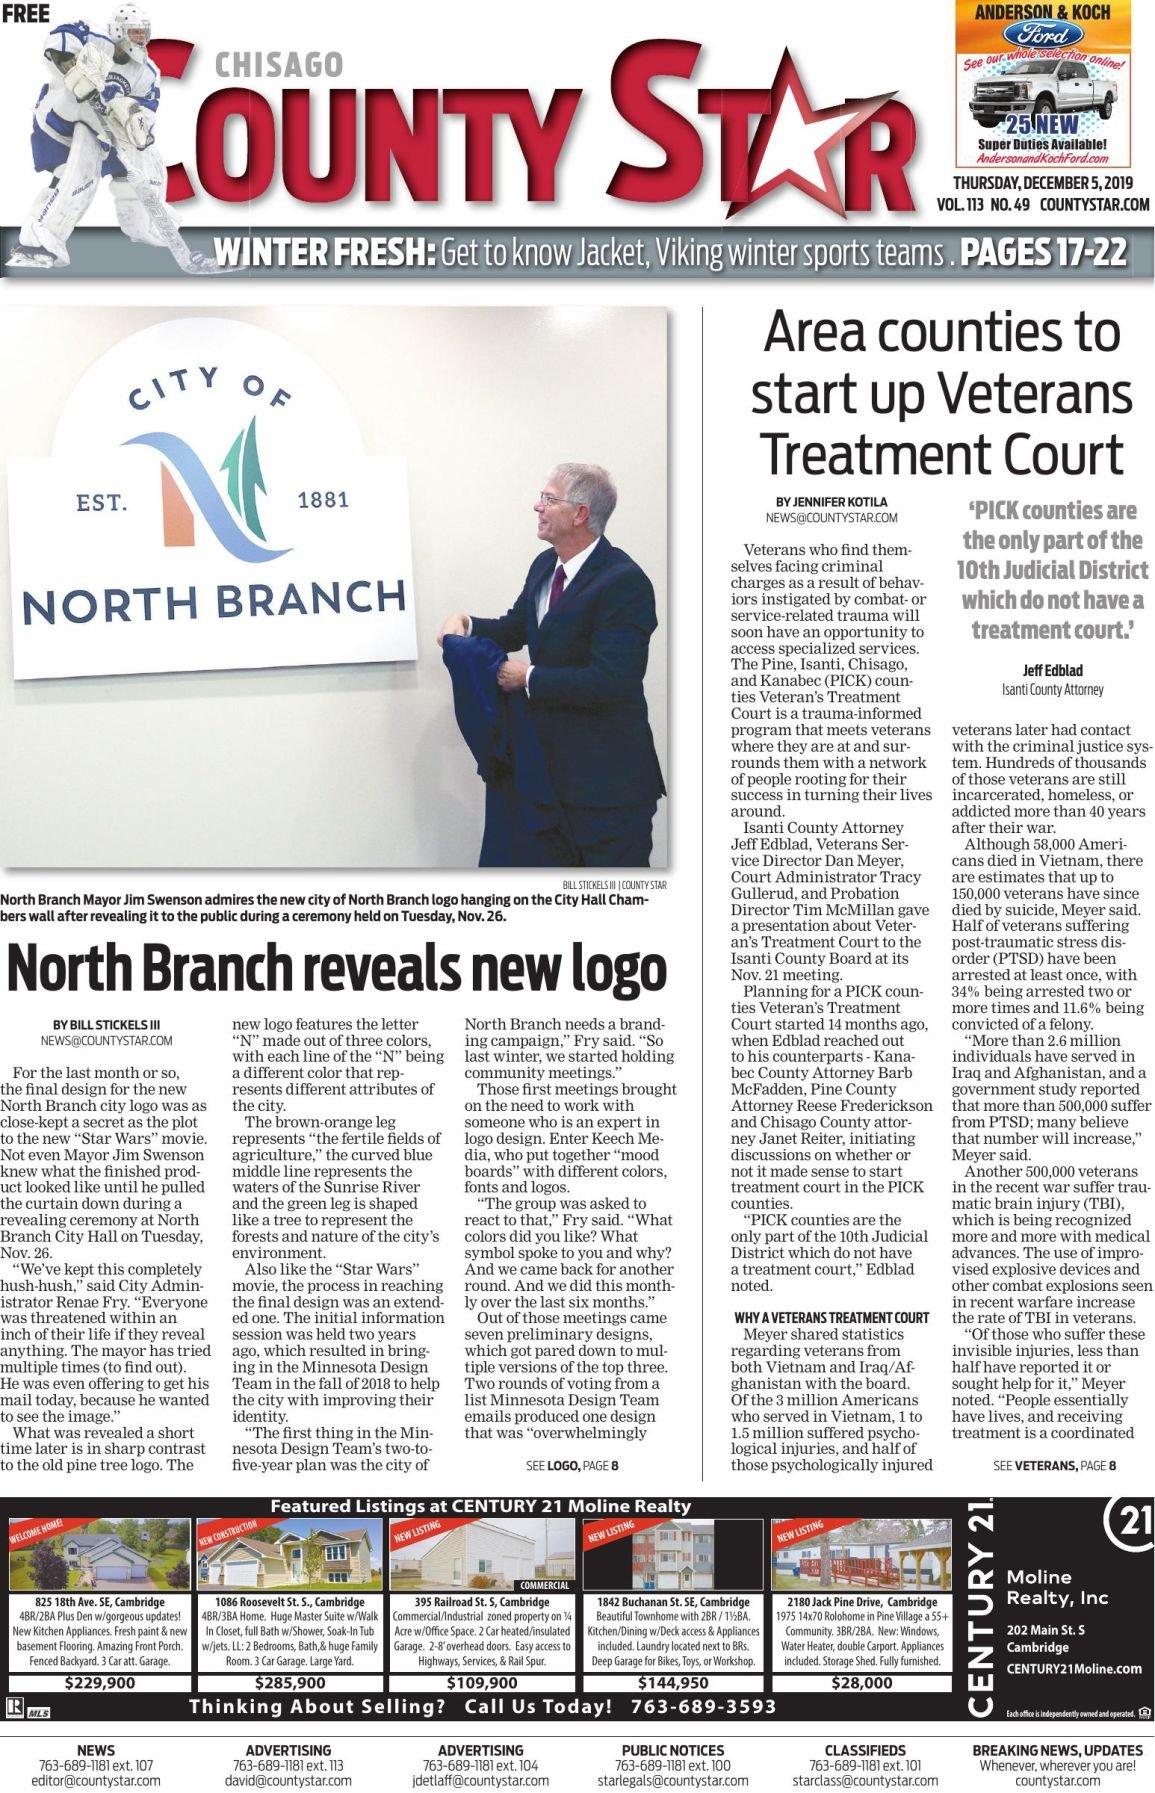 Chisago County Star December 5, 2019 e-edition